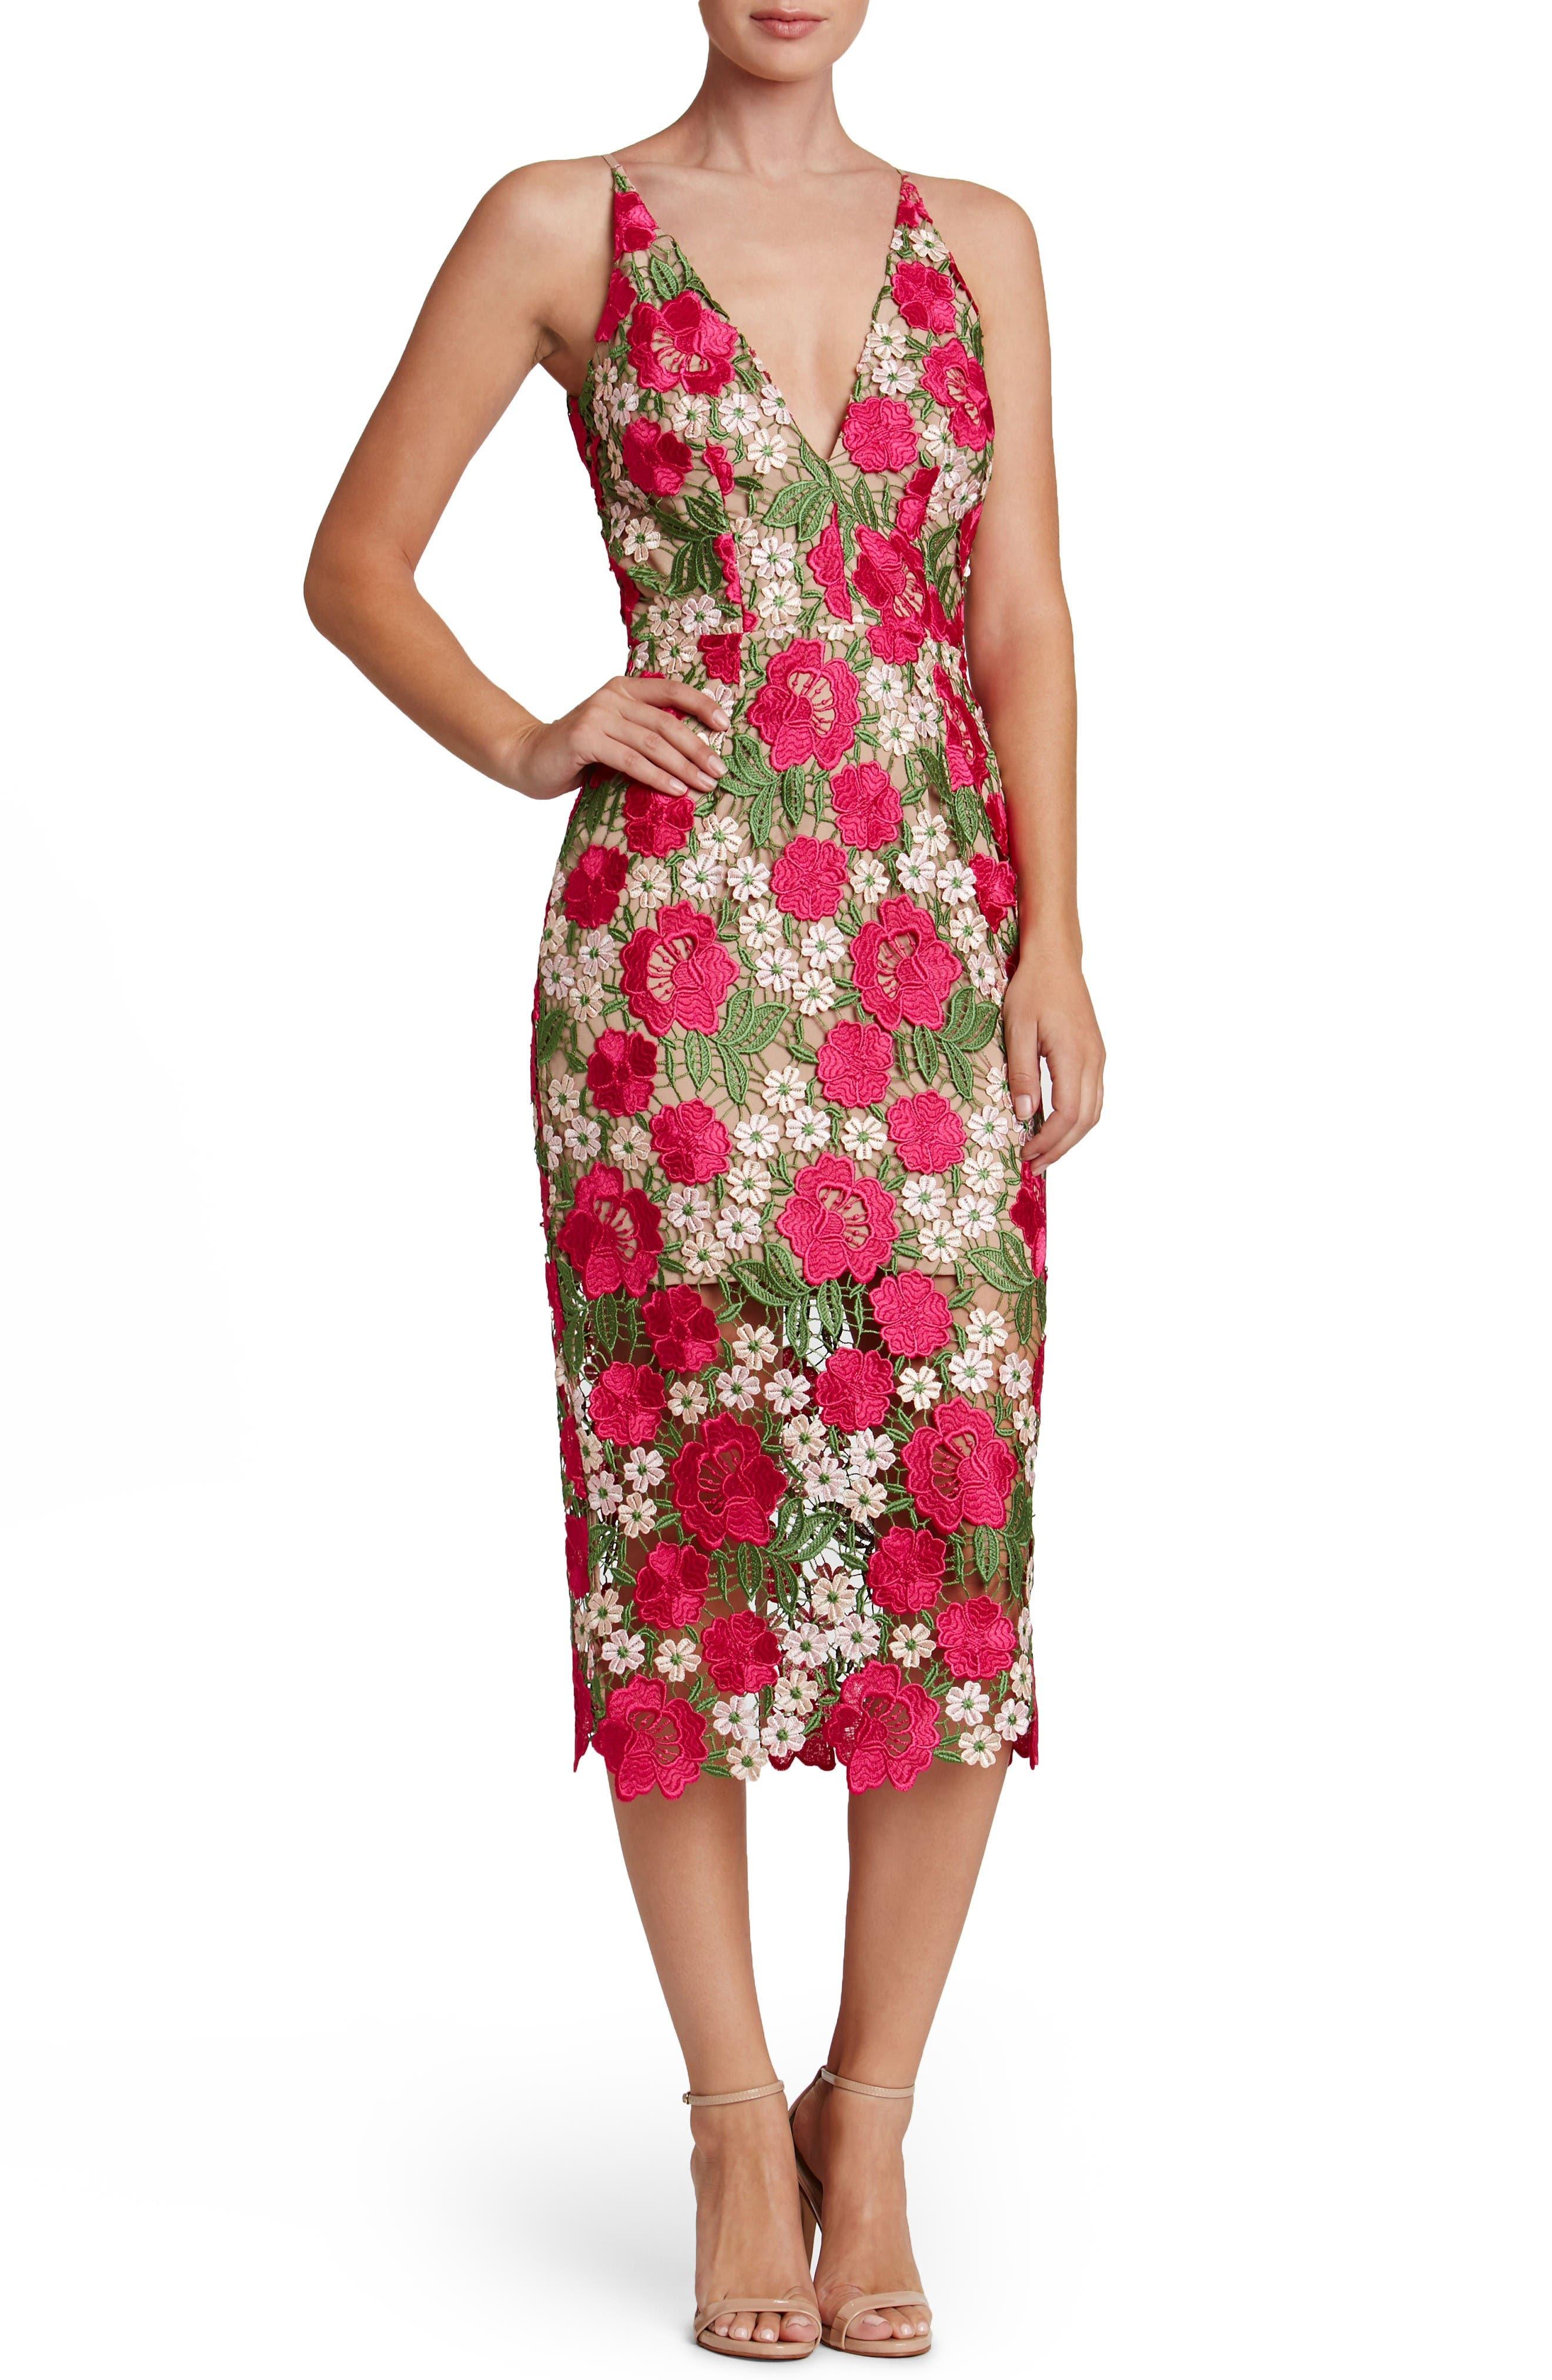 Aurora Floral Crochet Midi Dress,                         Main,                         color, Fuchsia/ Green Floral